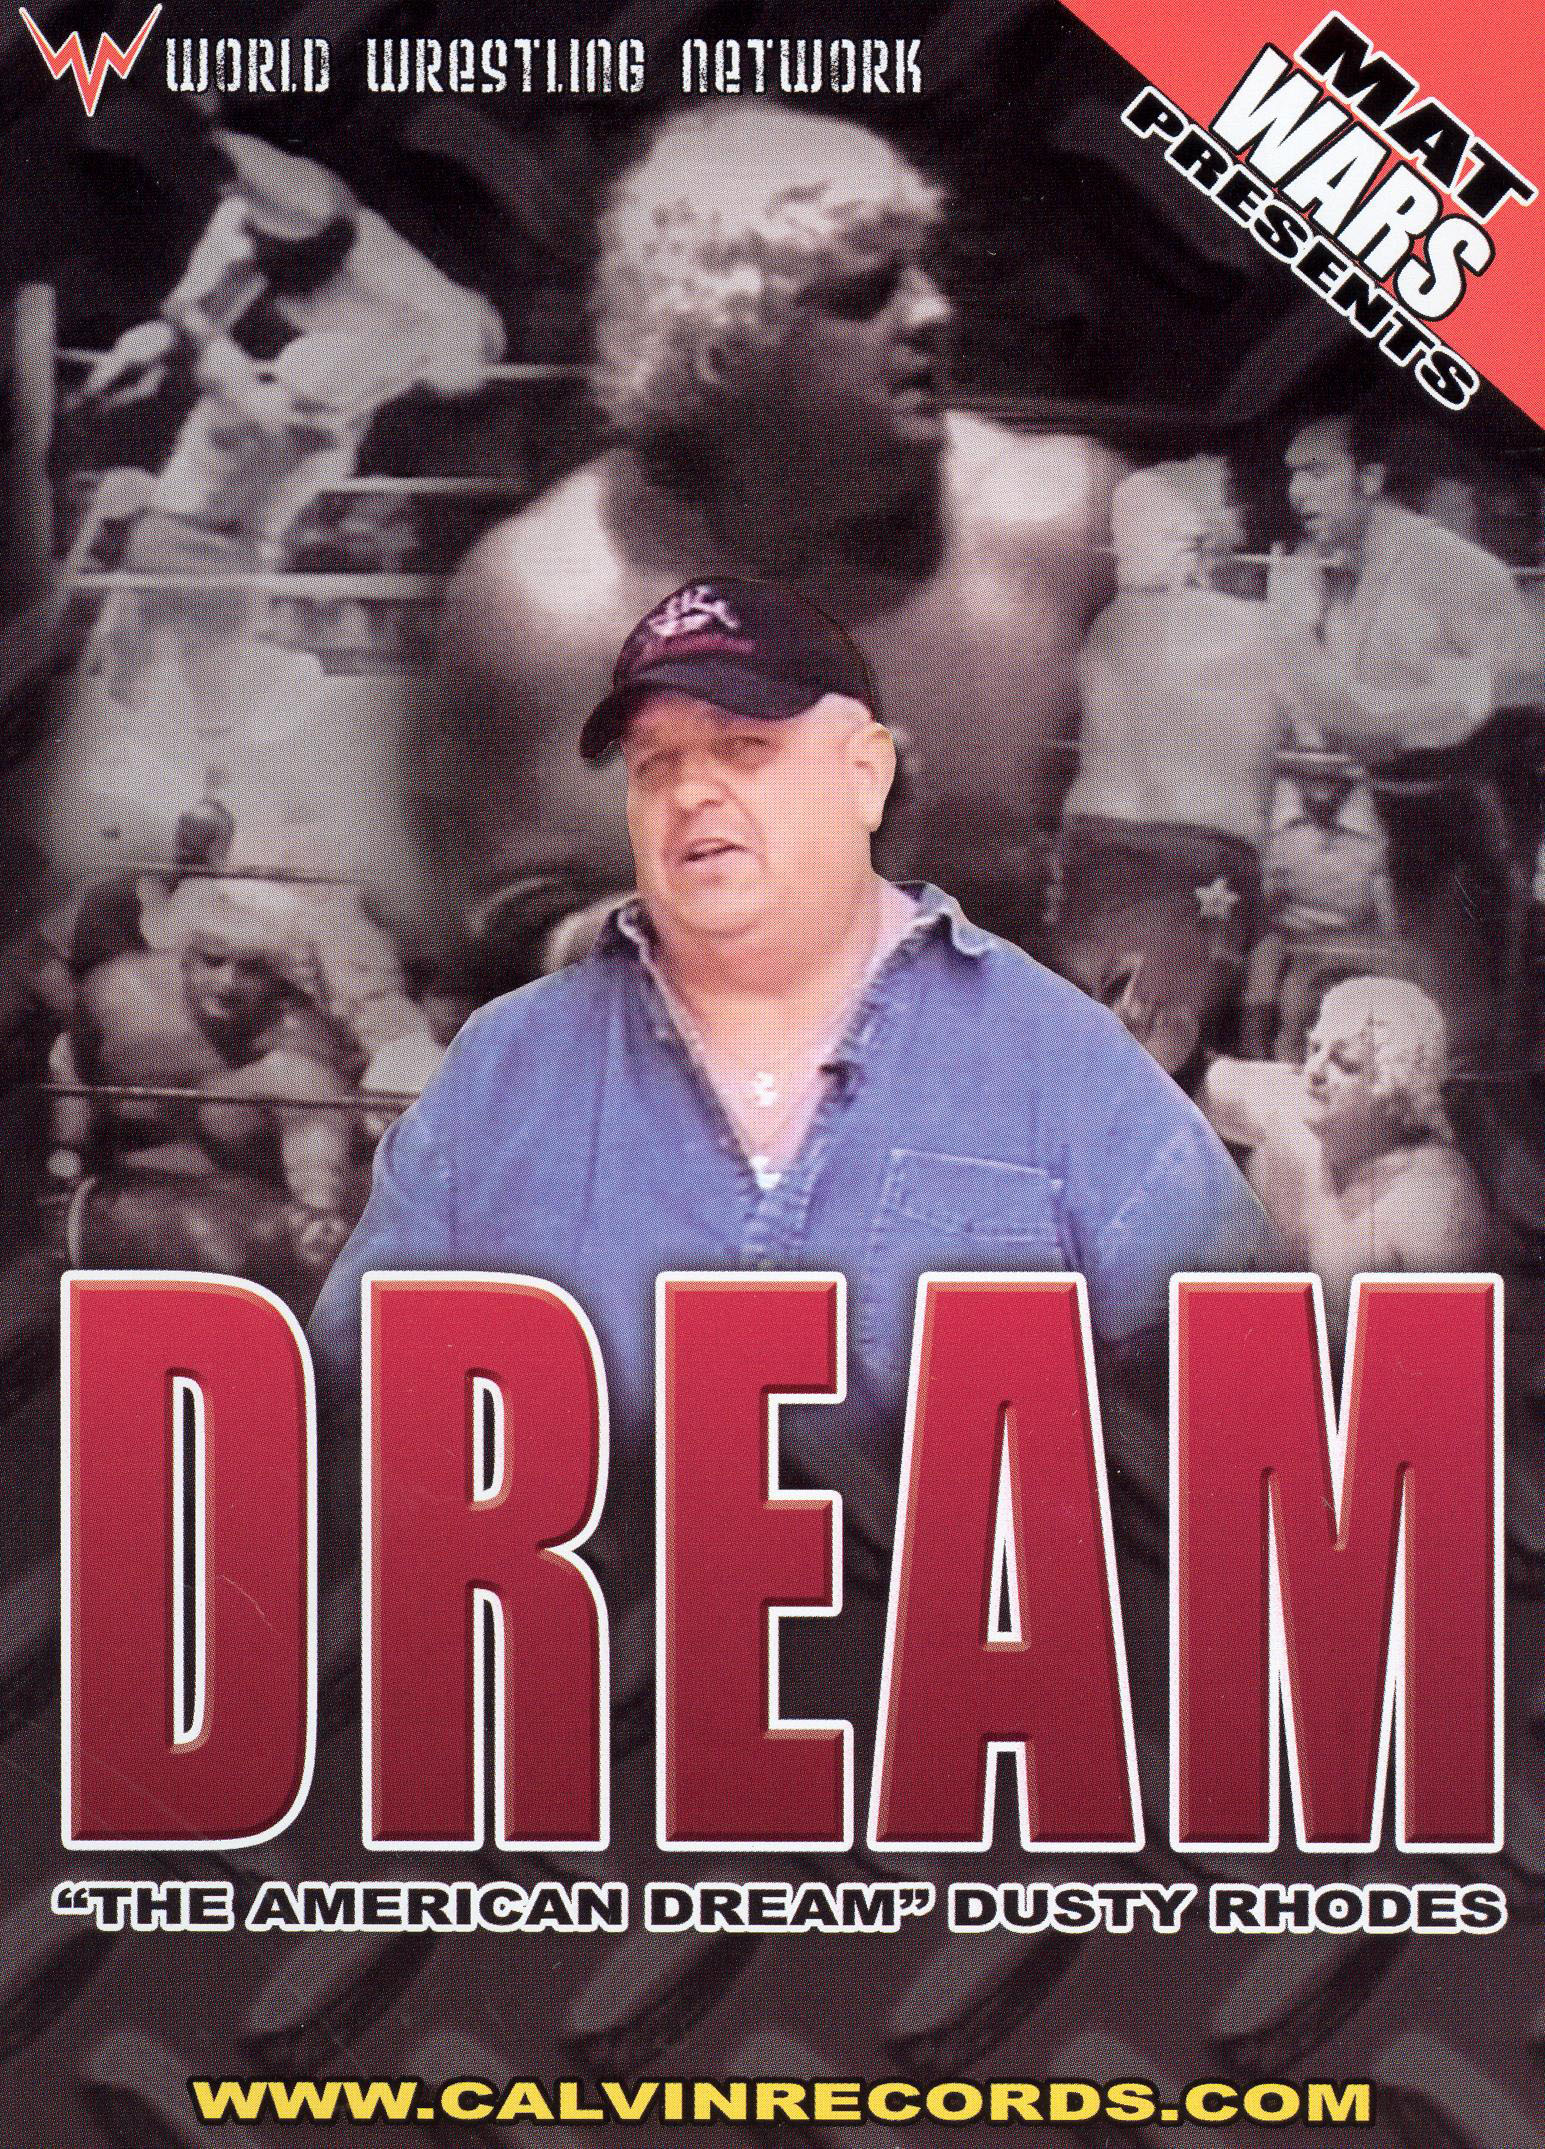 Mat Wars Presents: American Dream Dusty Rhodes